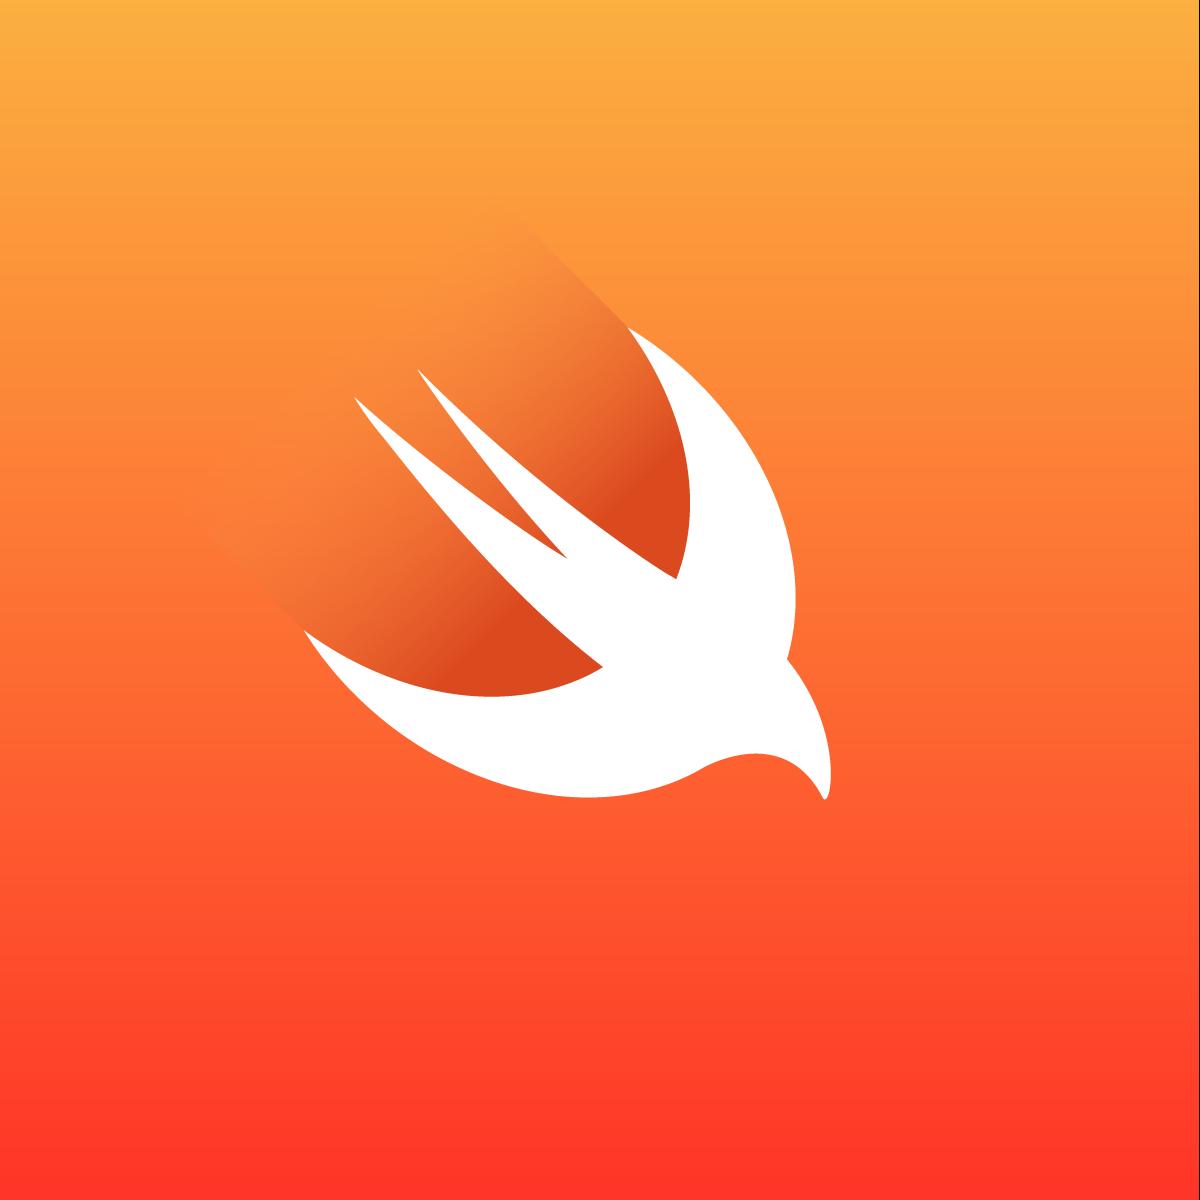 Swift ios app development course